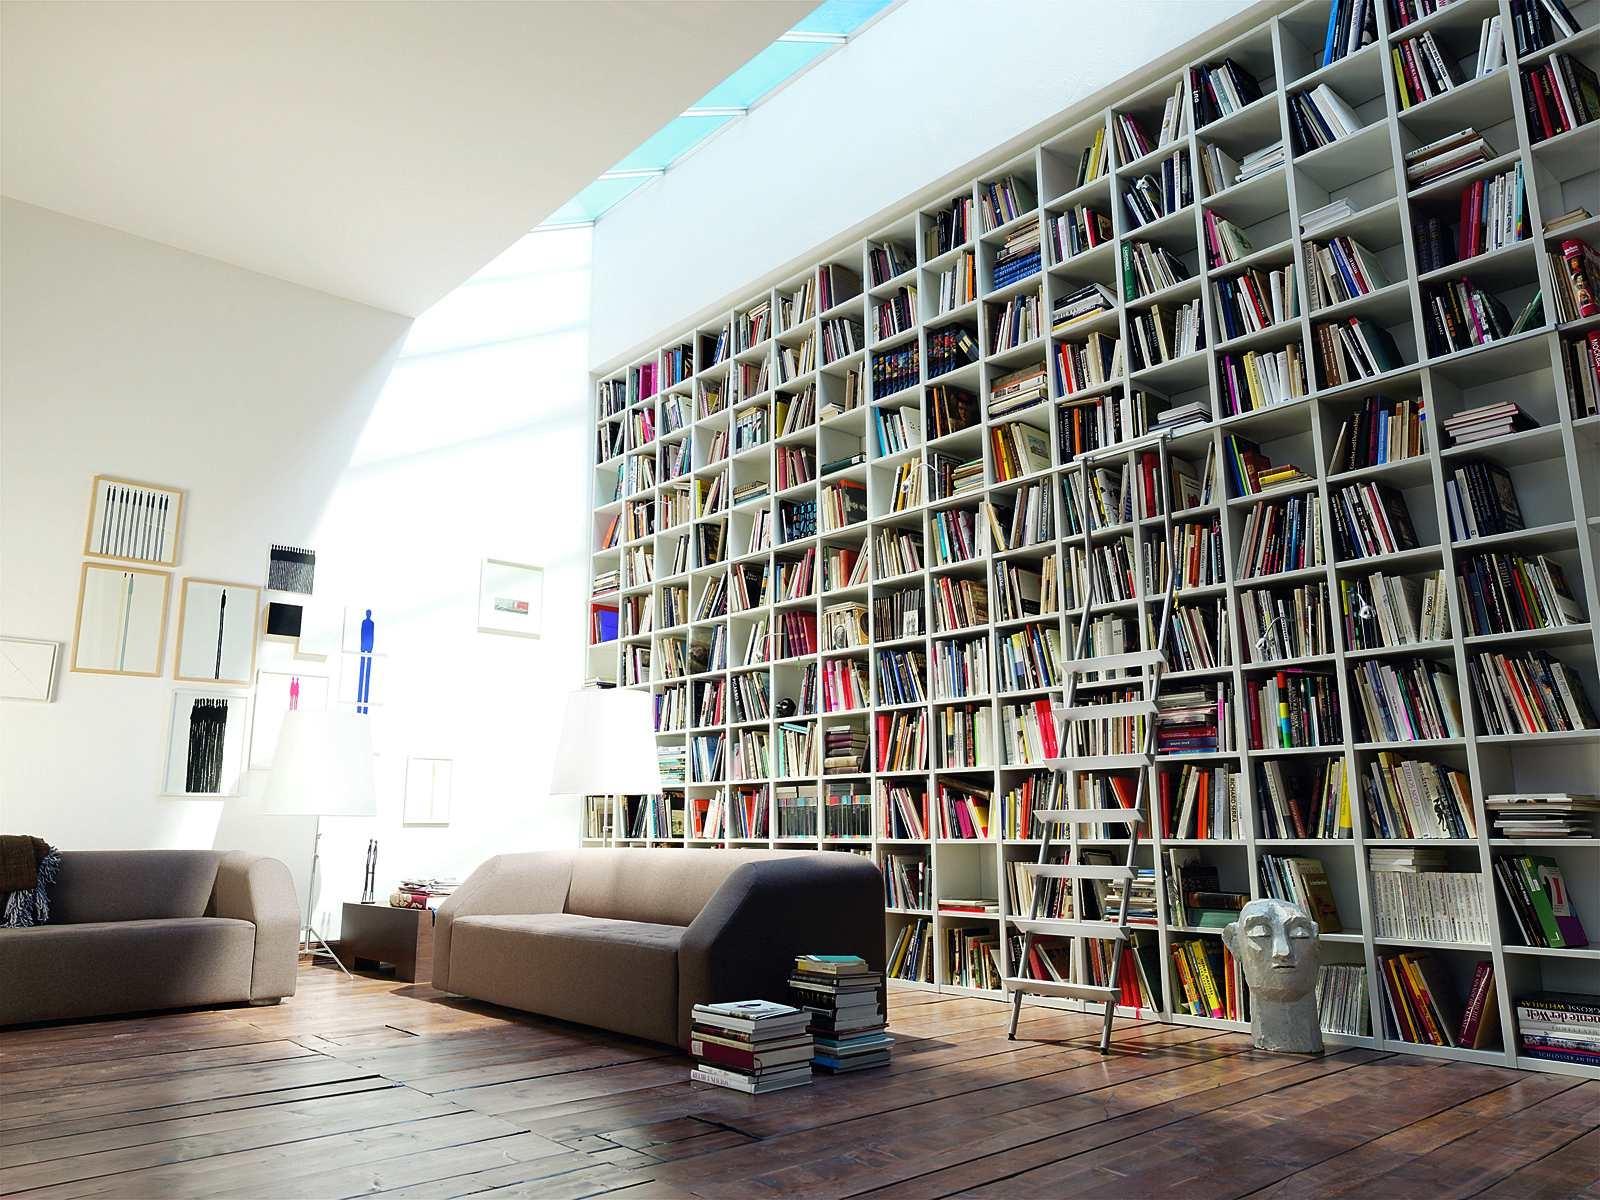 Amazing Bookshelf Design Futuristic Home Design Within Large Bookcase Plans (View 1 of 15)